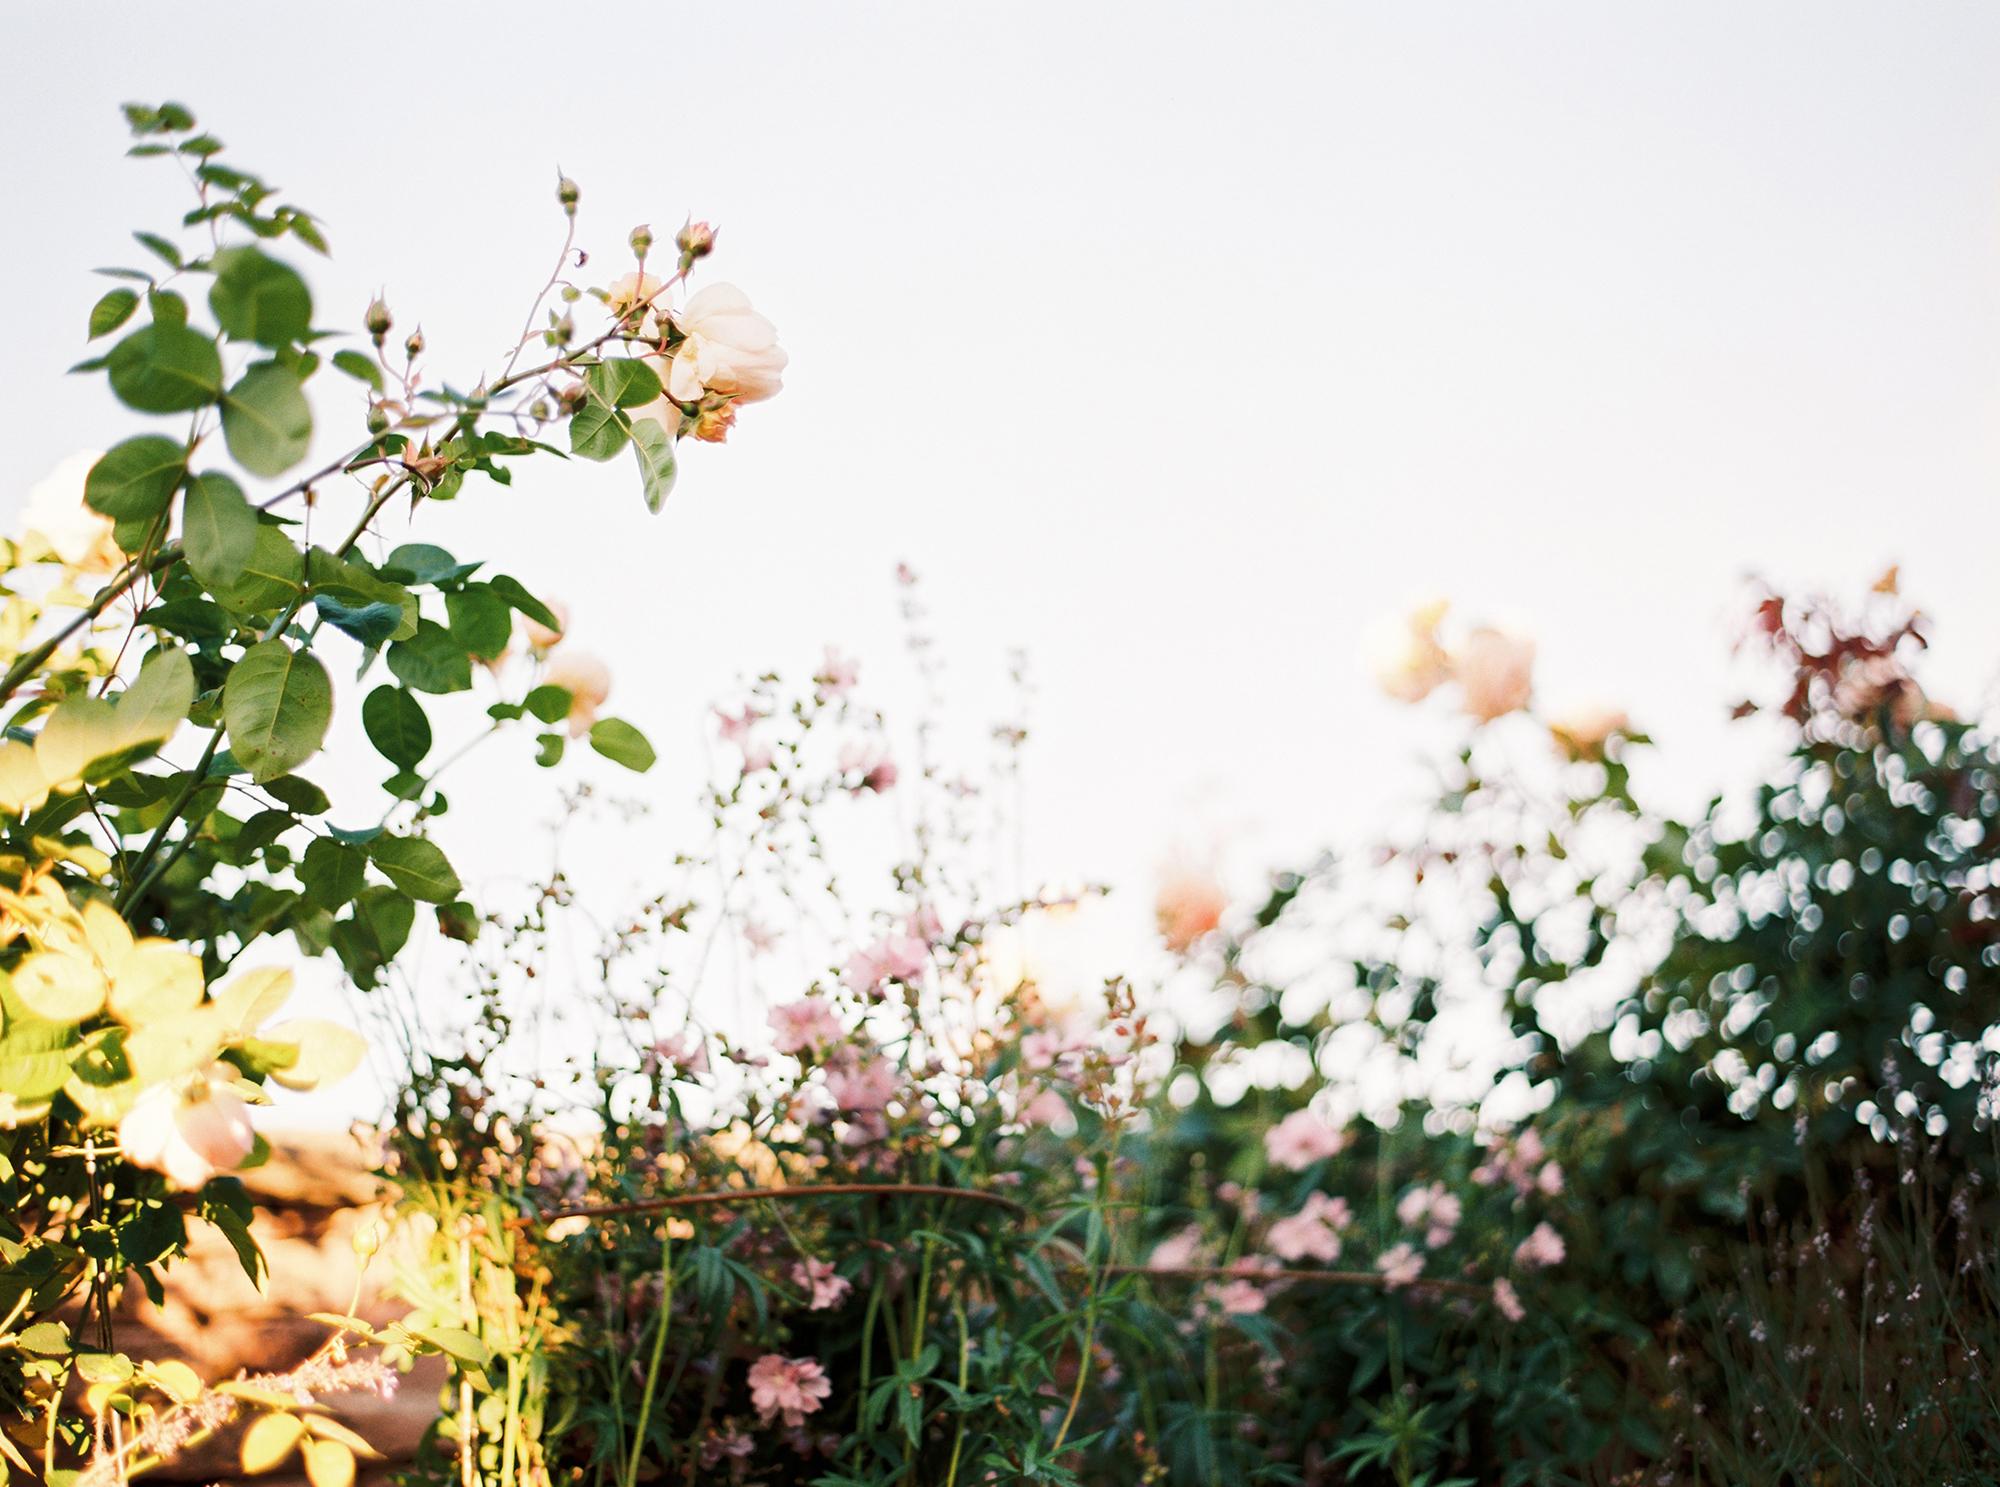 branding_photographer_cumbria (1).jpg